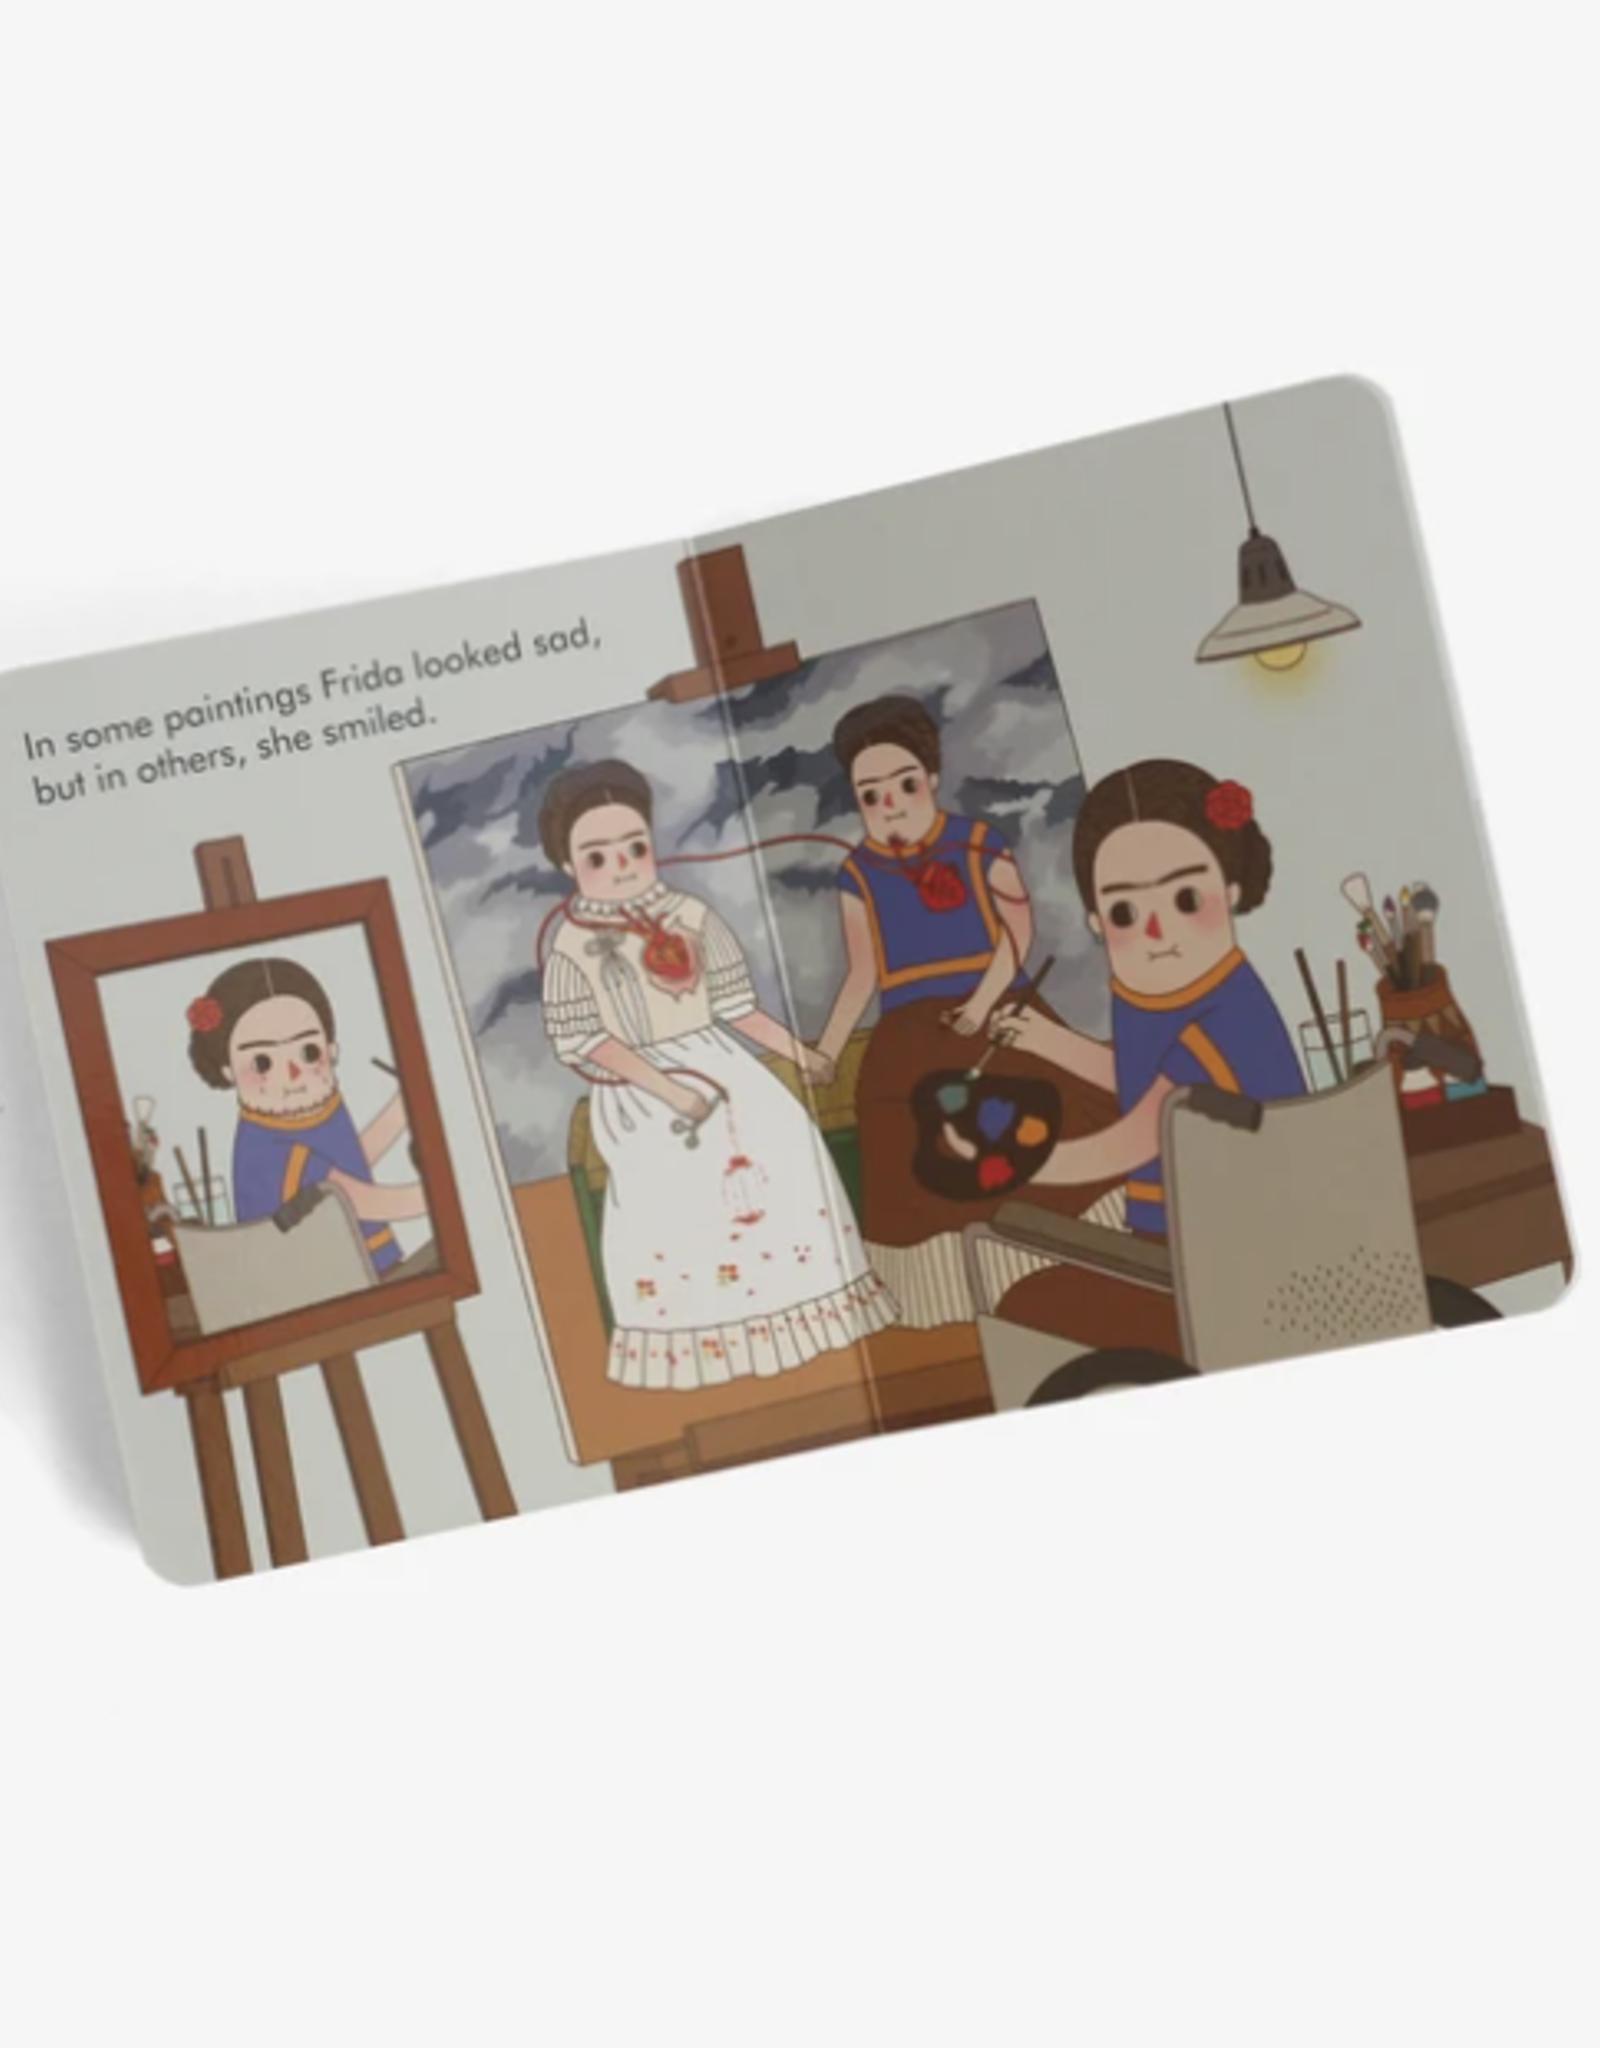 Frida Kahlo Board Book